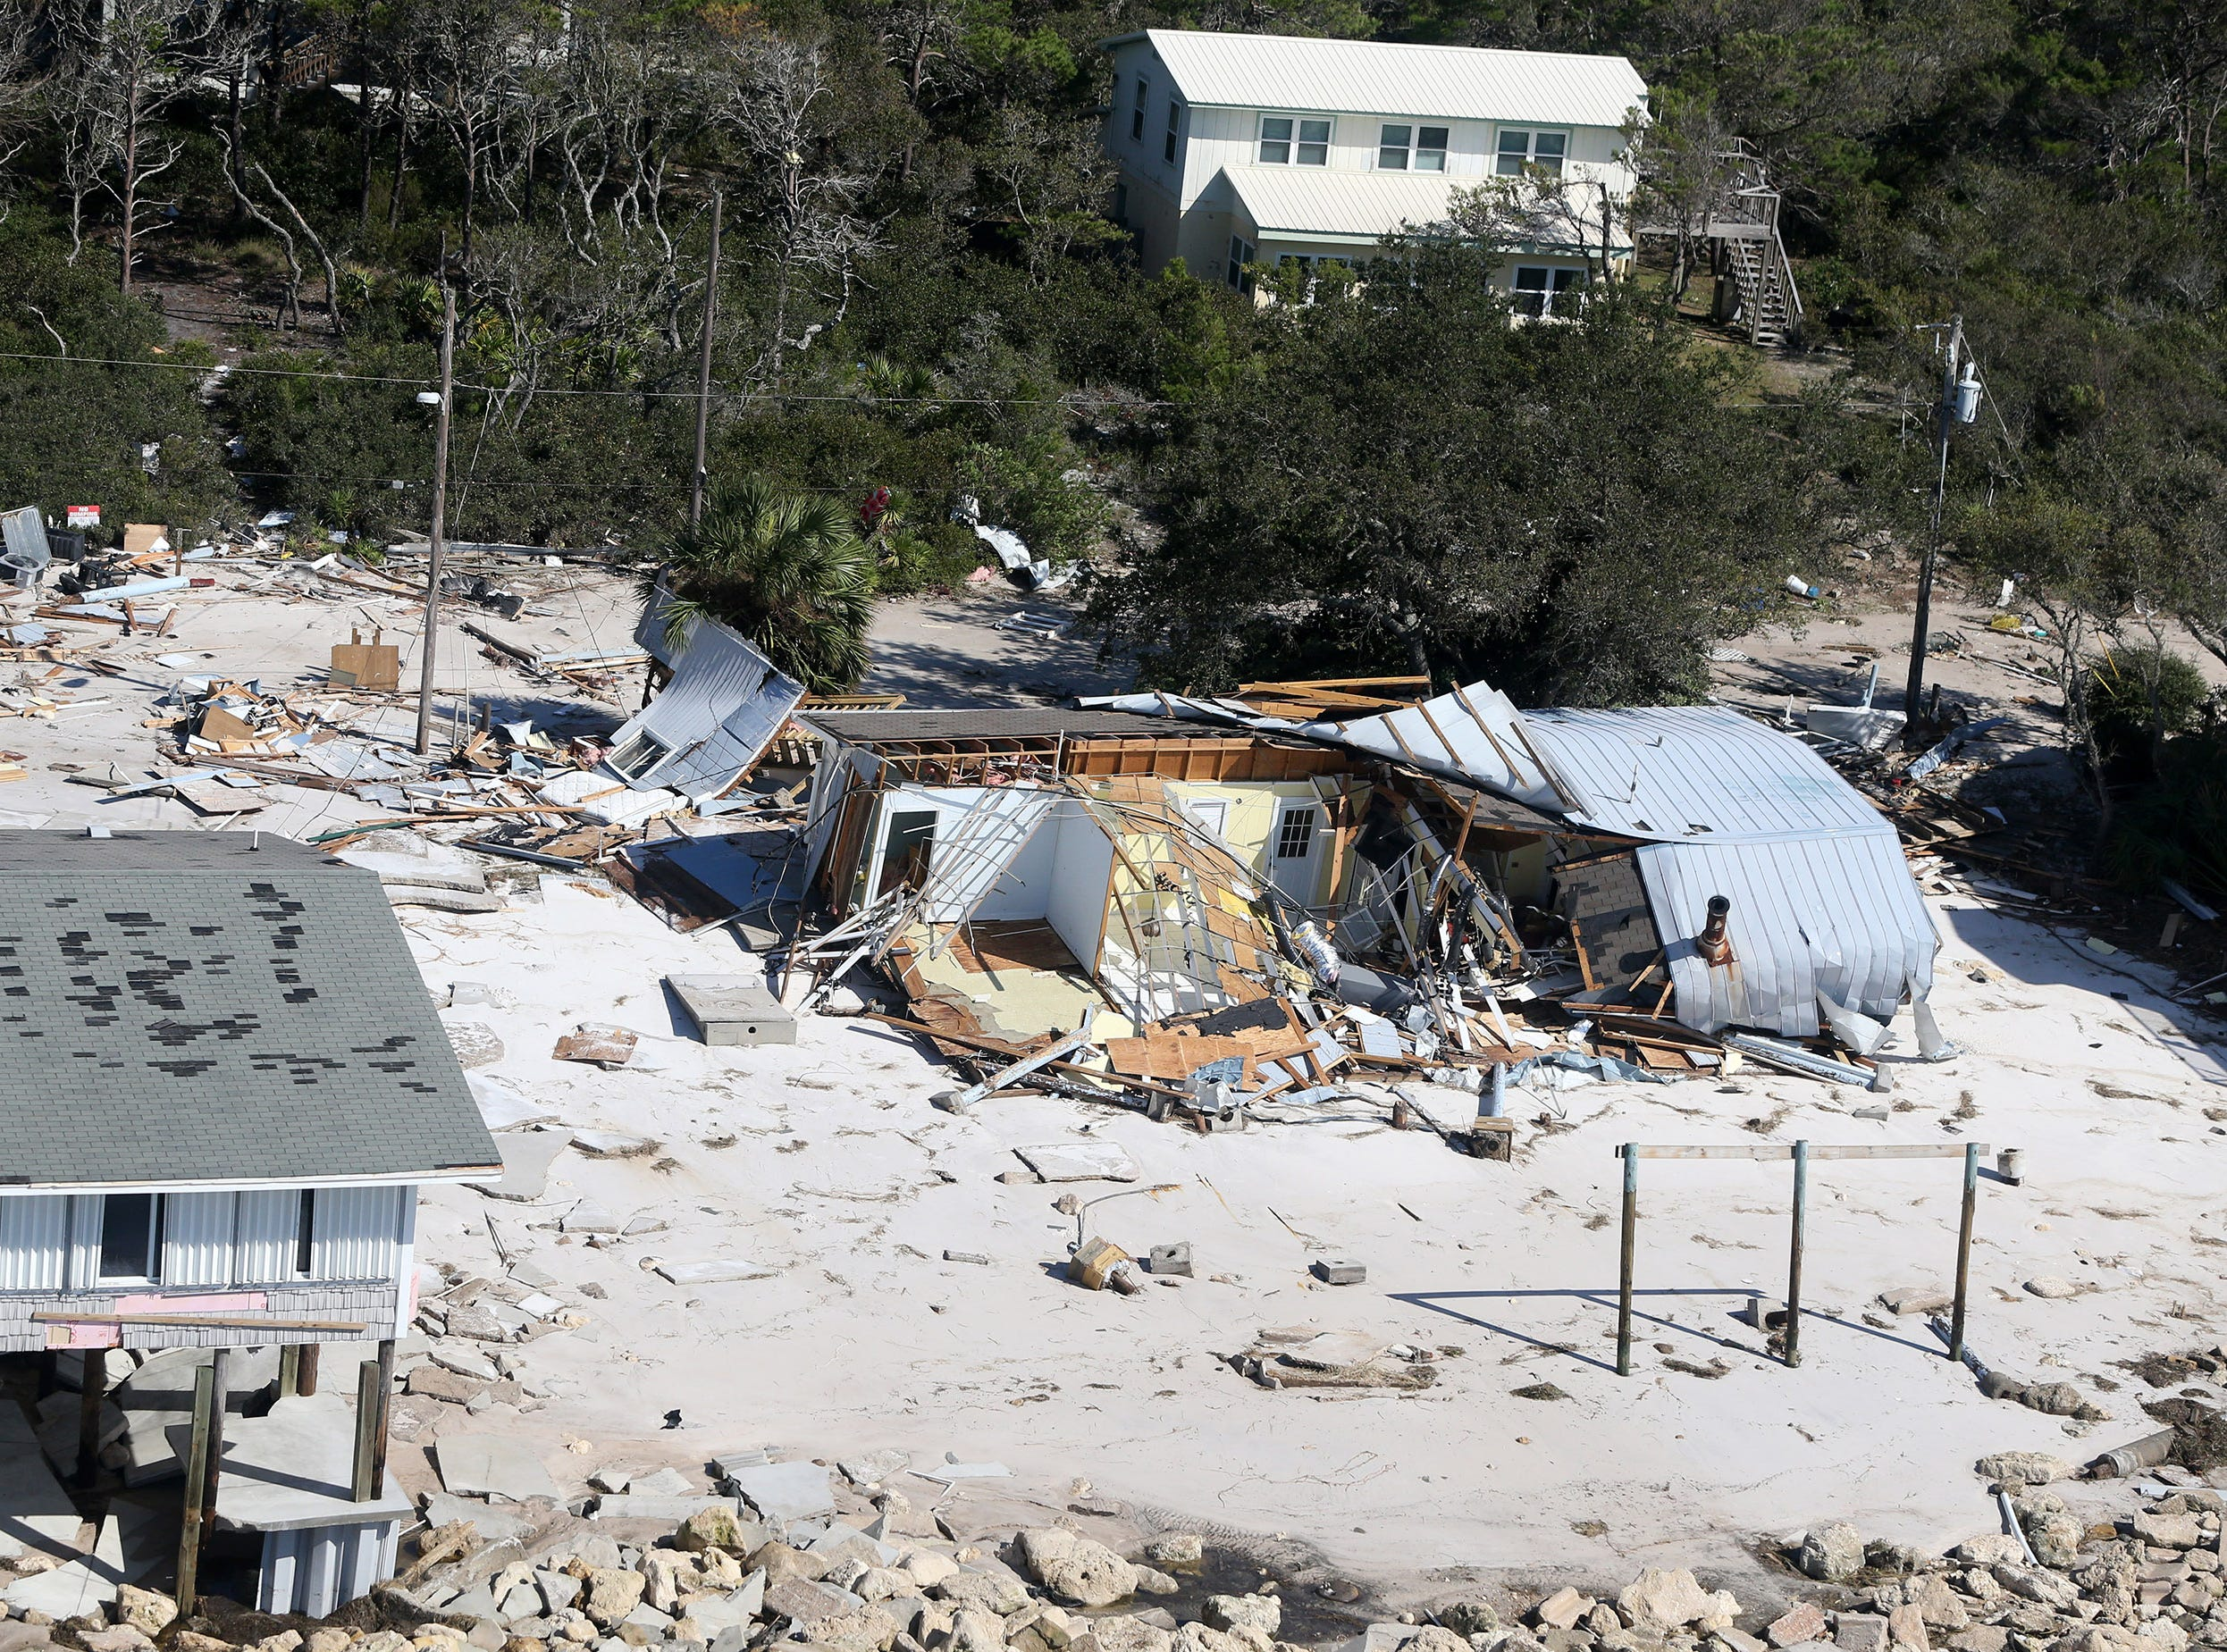 Oct 11, 2018; Alligator Point, FL, USA; Hurricane Michael damaged several homes on Dog Island in Franklin County, Florida. Mandatory Credit: Kinfay Moroti/The News-Press